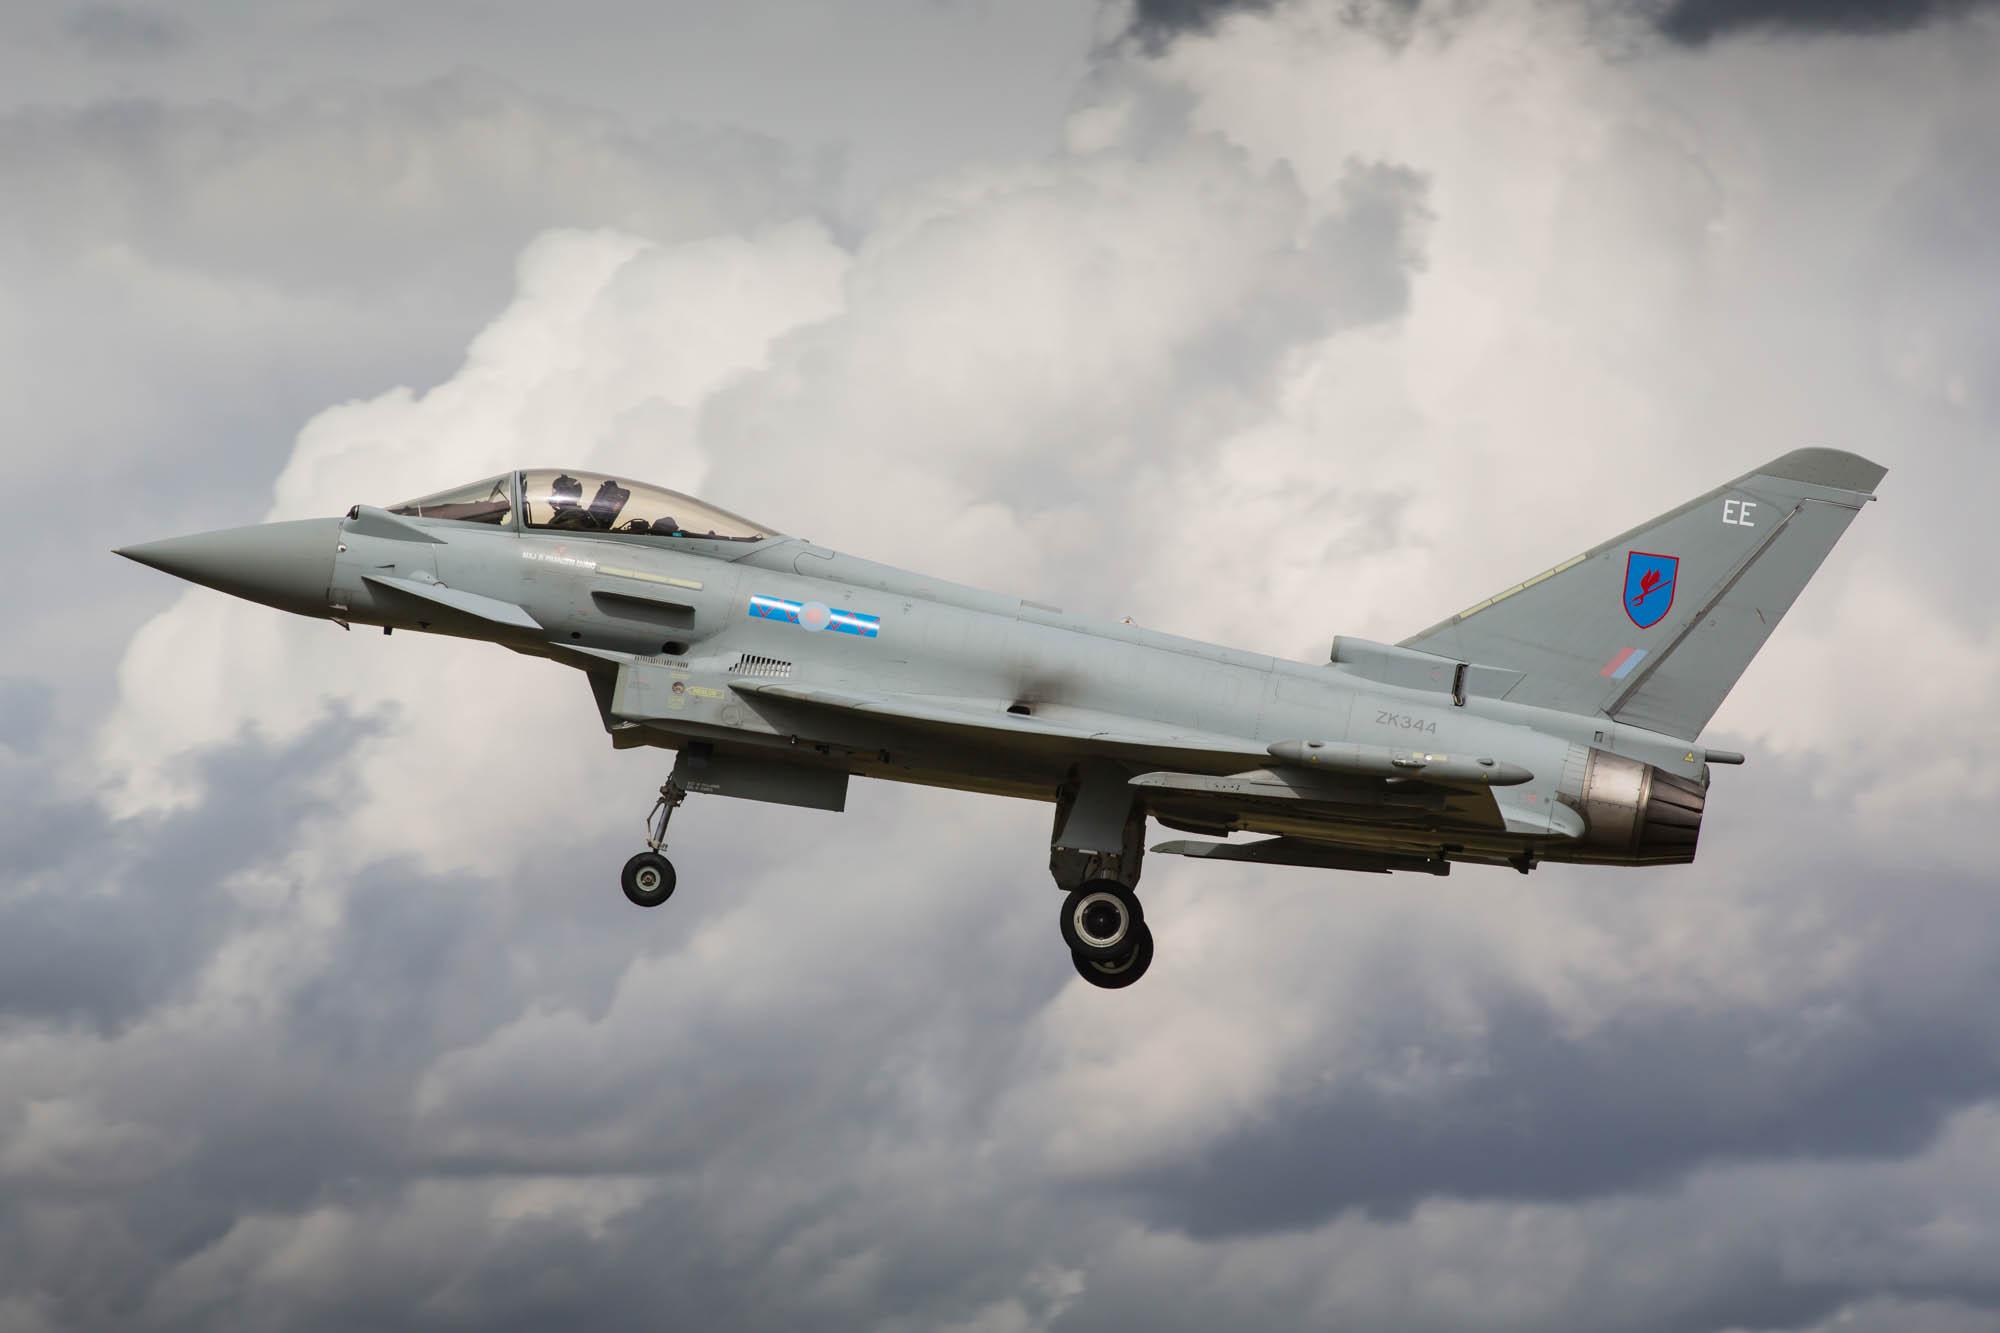 Aviation Photography - 6 Squadron RAF